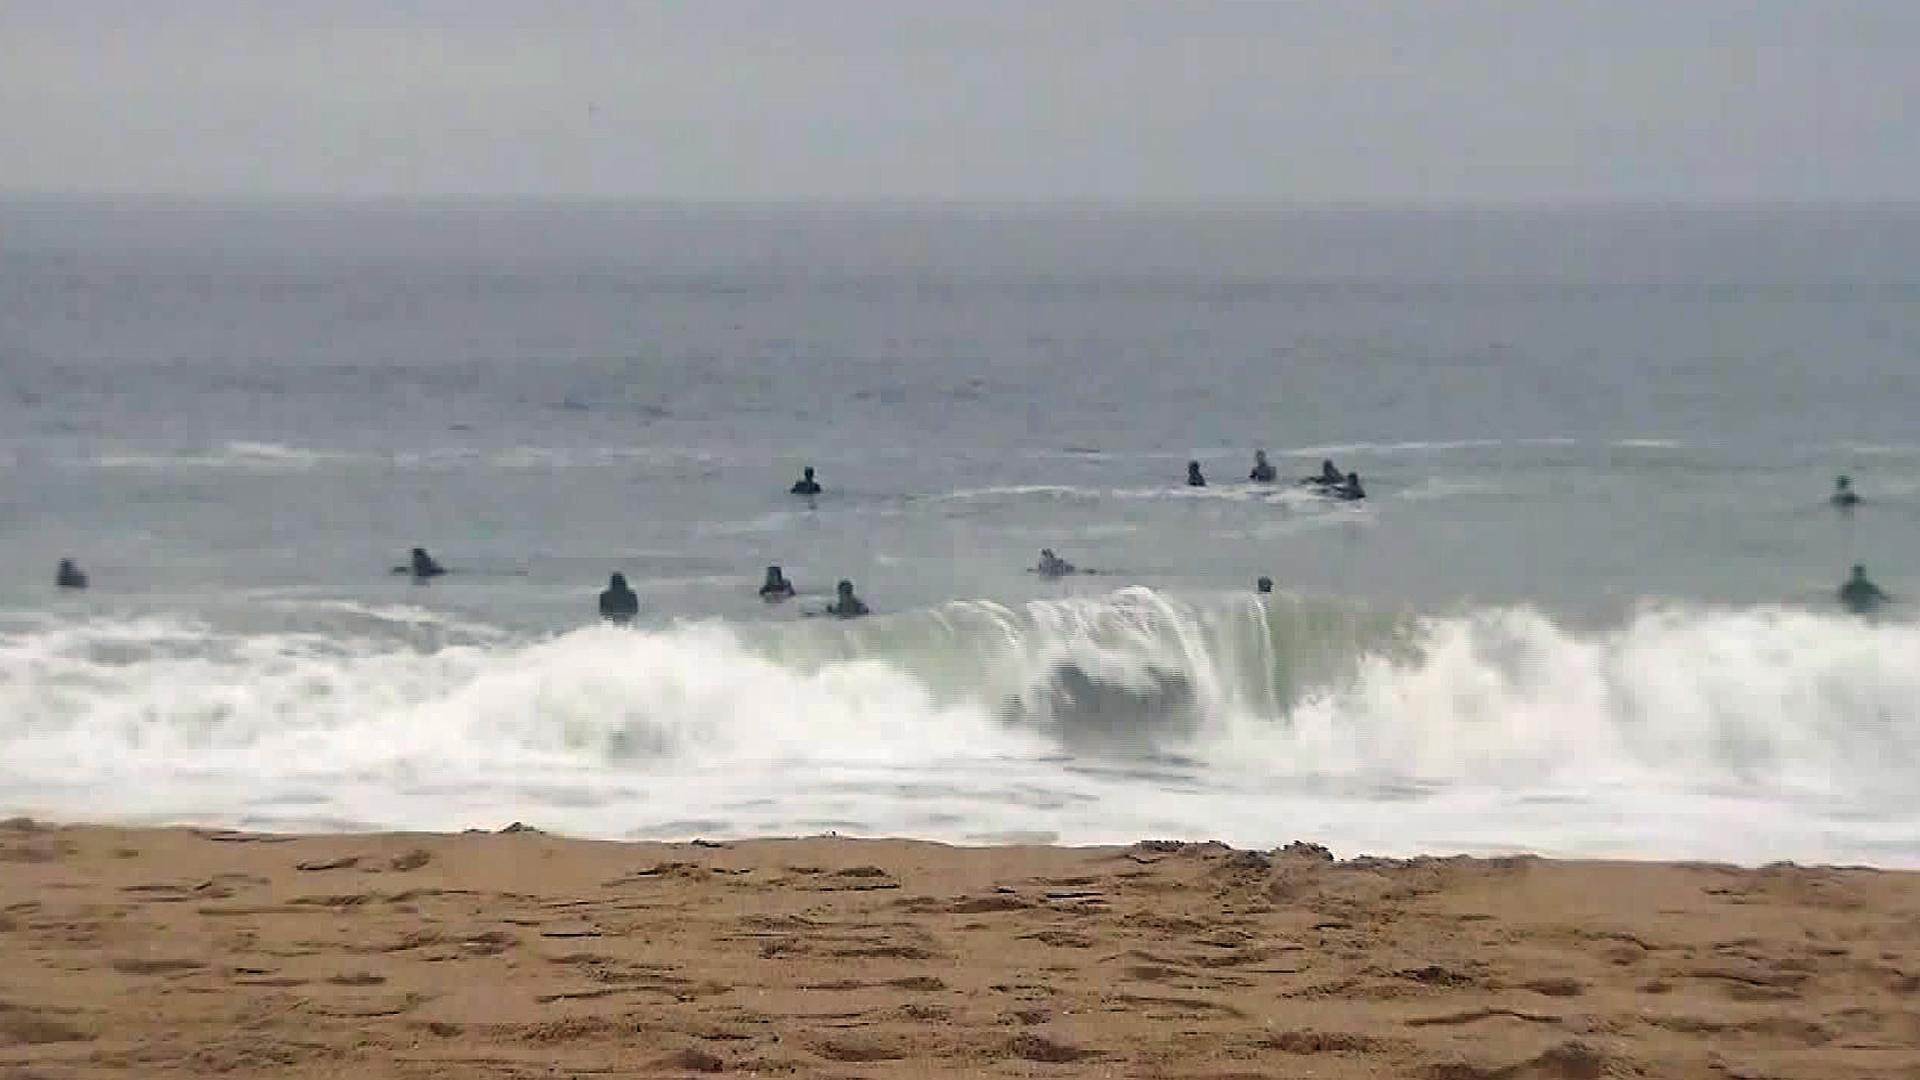 Surfers are seen off Newport Beach on July 12, 2017. (Credit: KTLA)